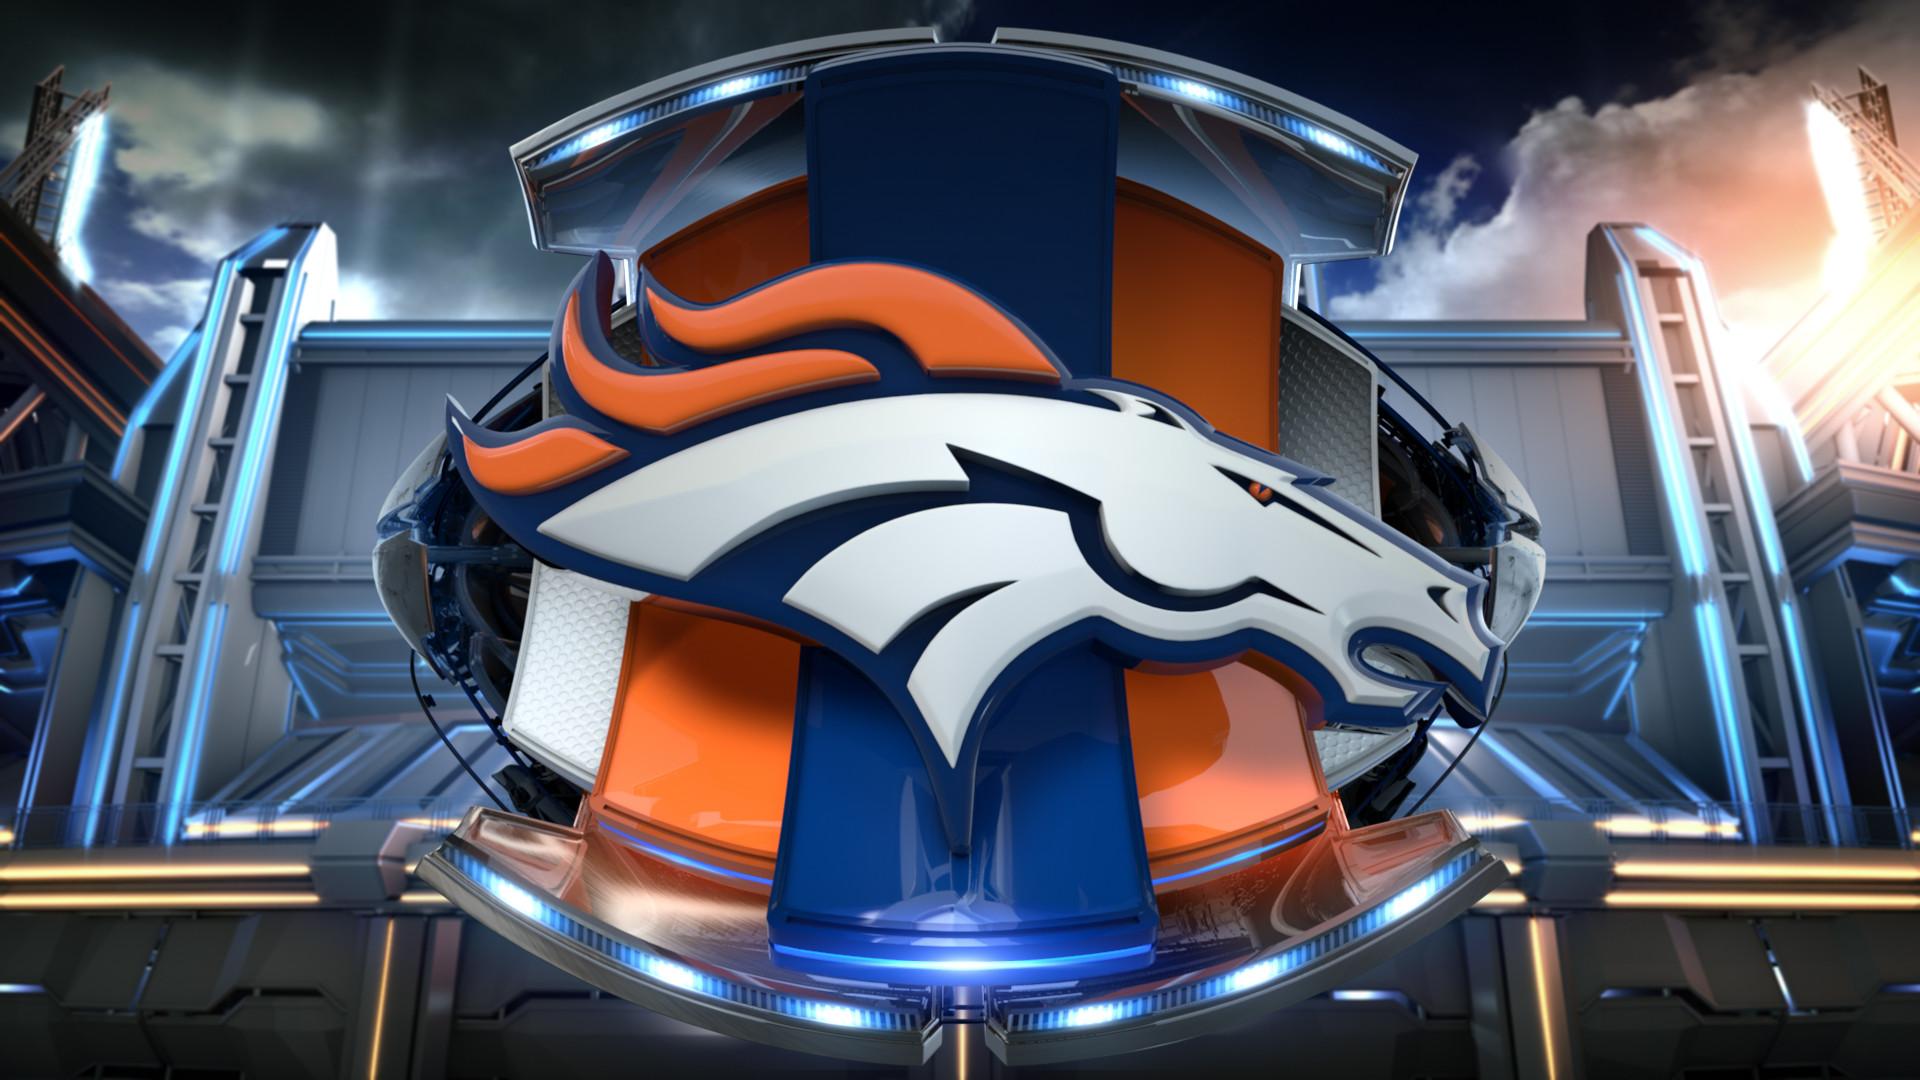 Denver Broncos Wallpaper HD Download Free | PixelsTalk Net